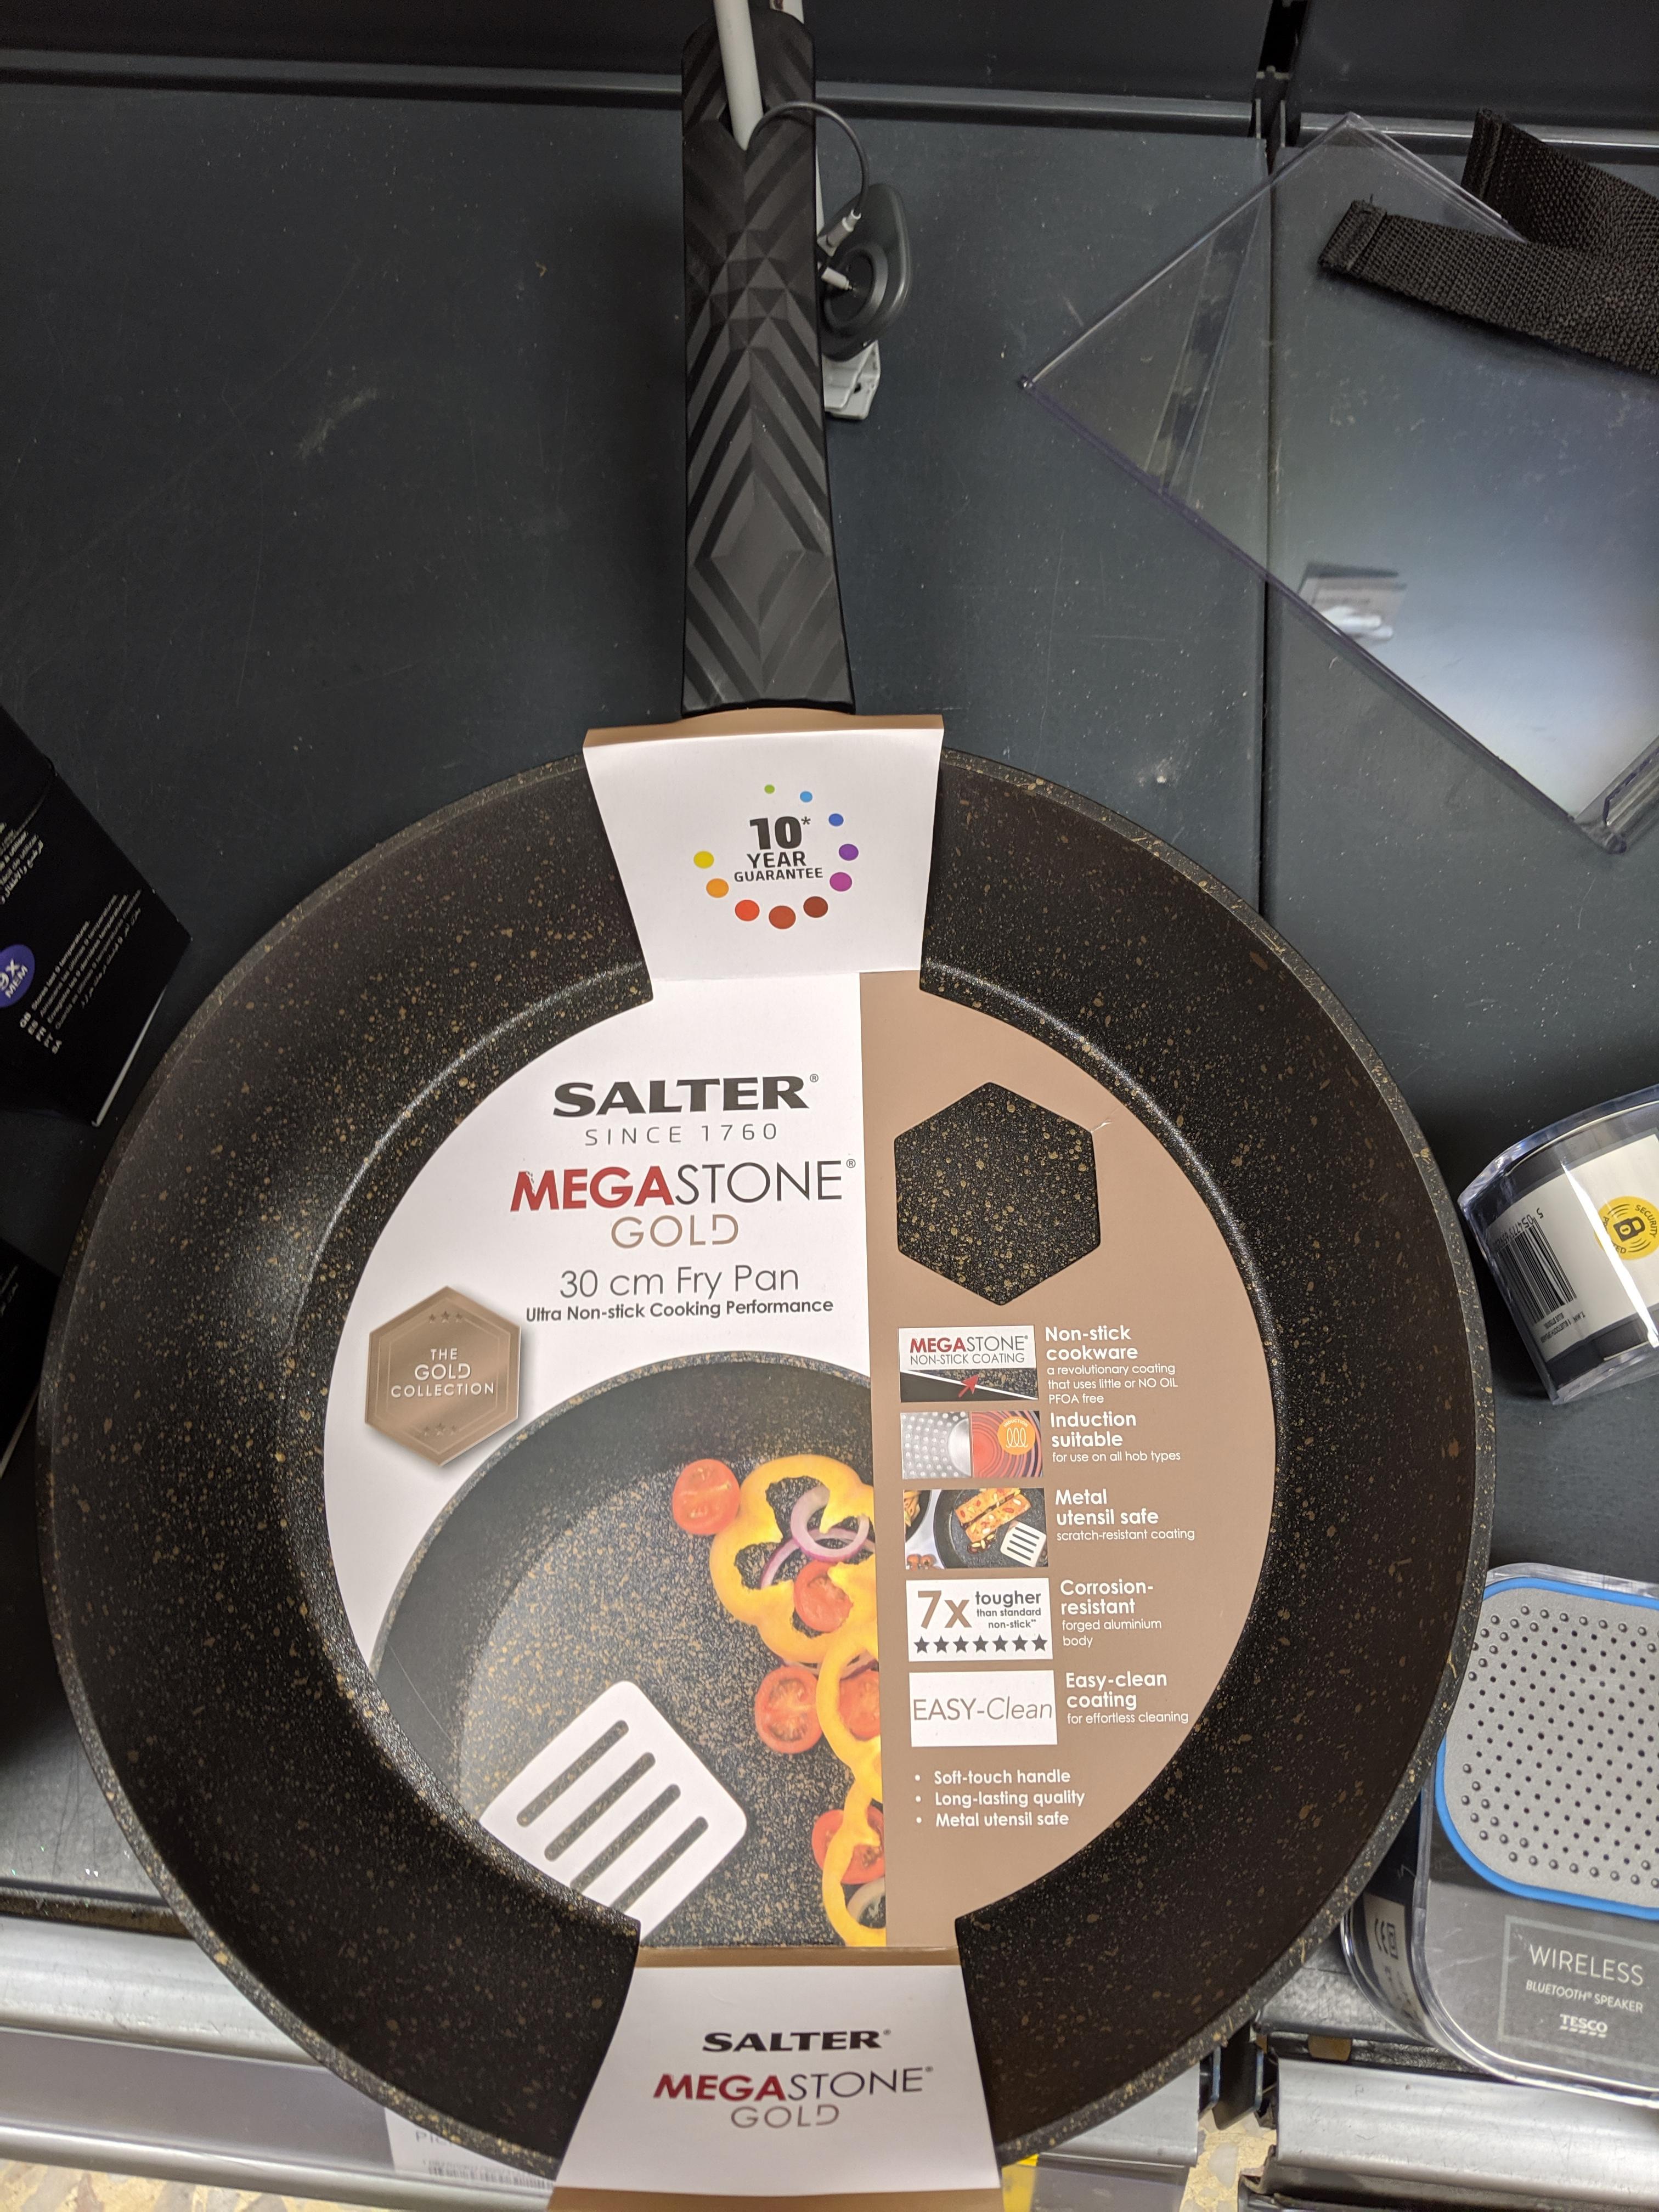 Salter Megastone Gold 30cm Fry Pan - £7.50 at Tesco In-store (Swindon)